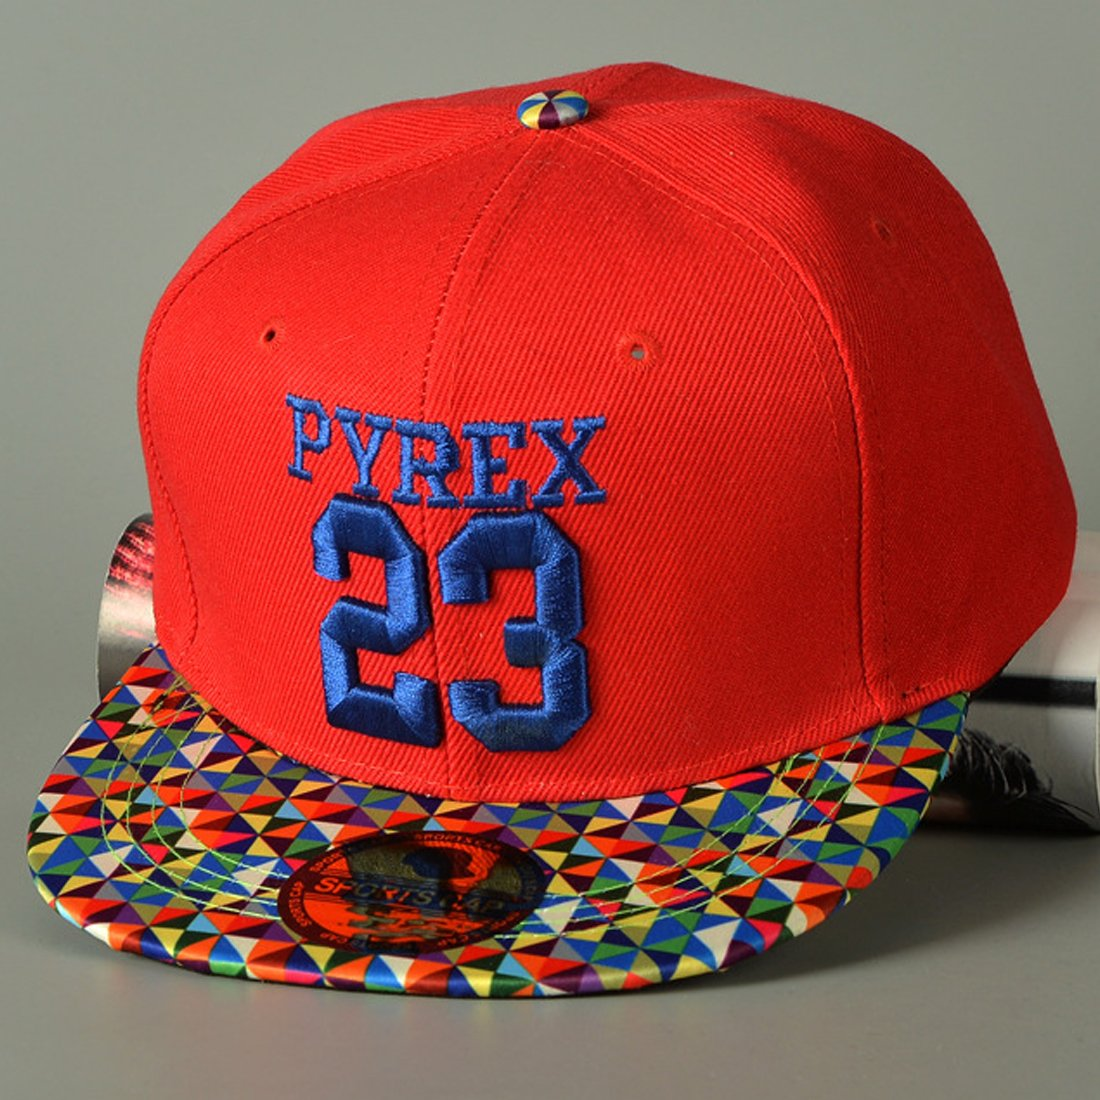 THENICE Bambino Hip Hop 23 Cappello Unisex Baseball cap